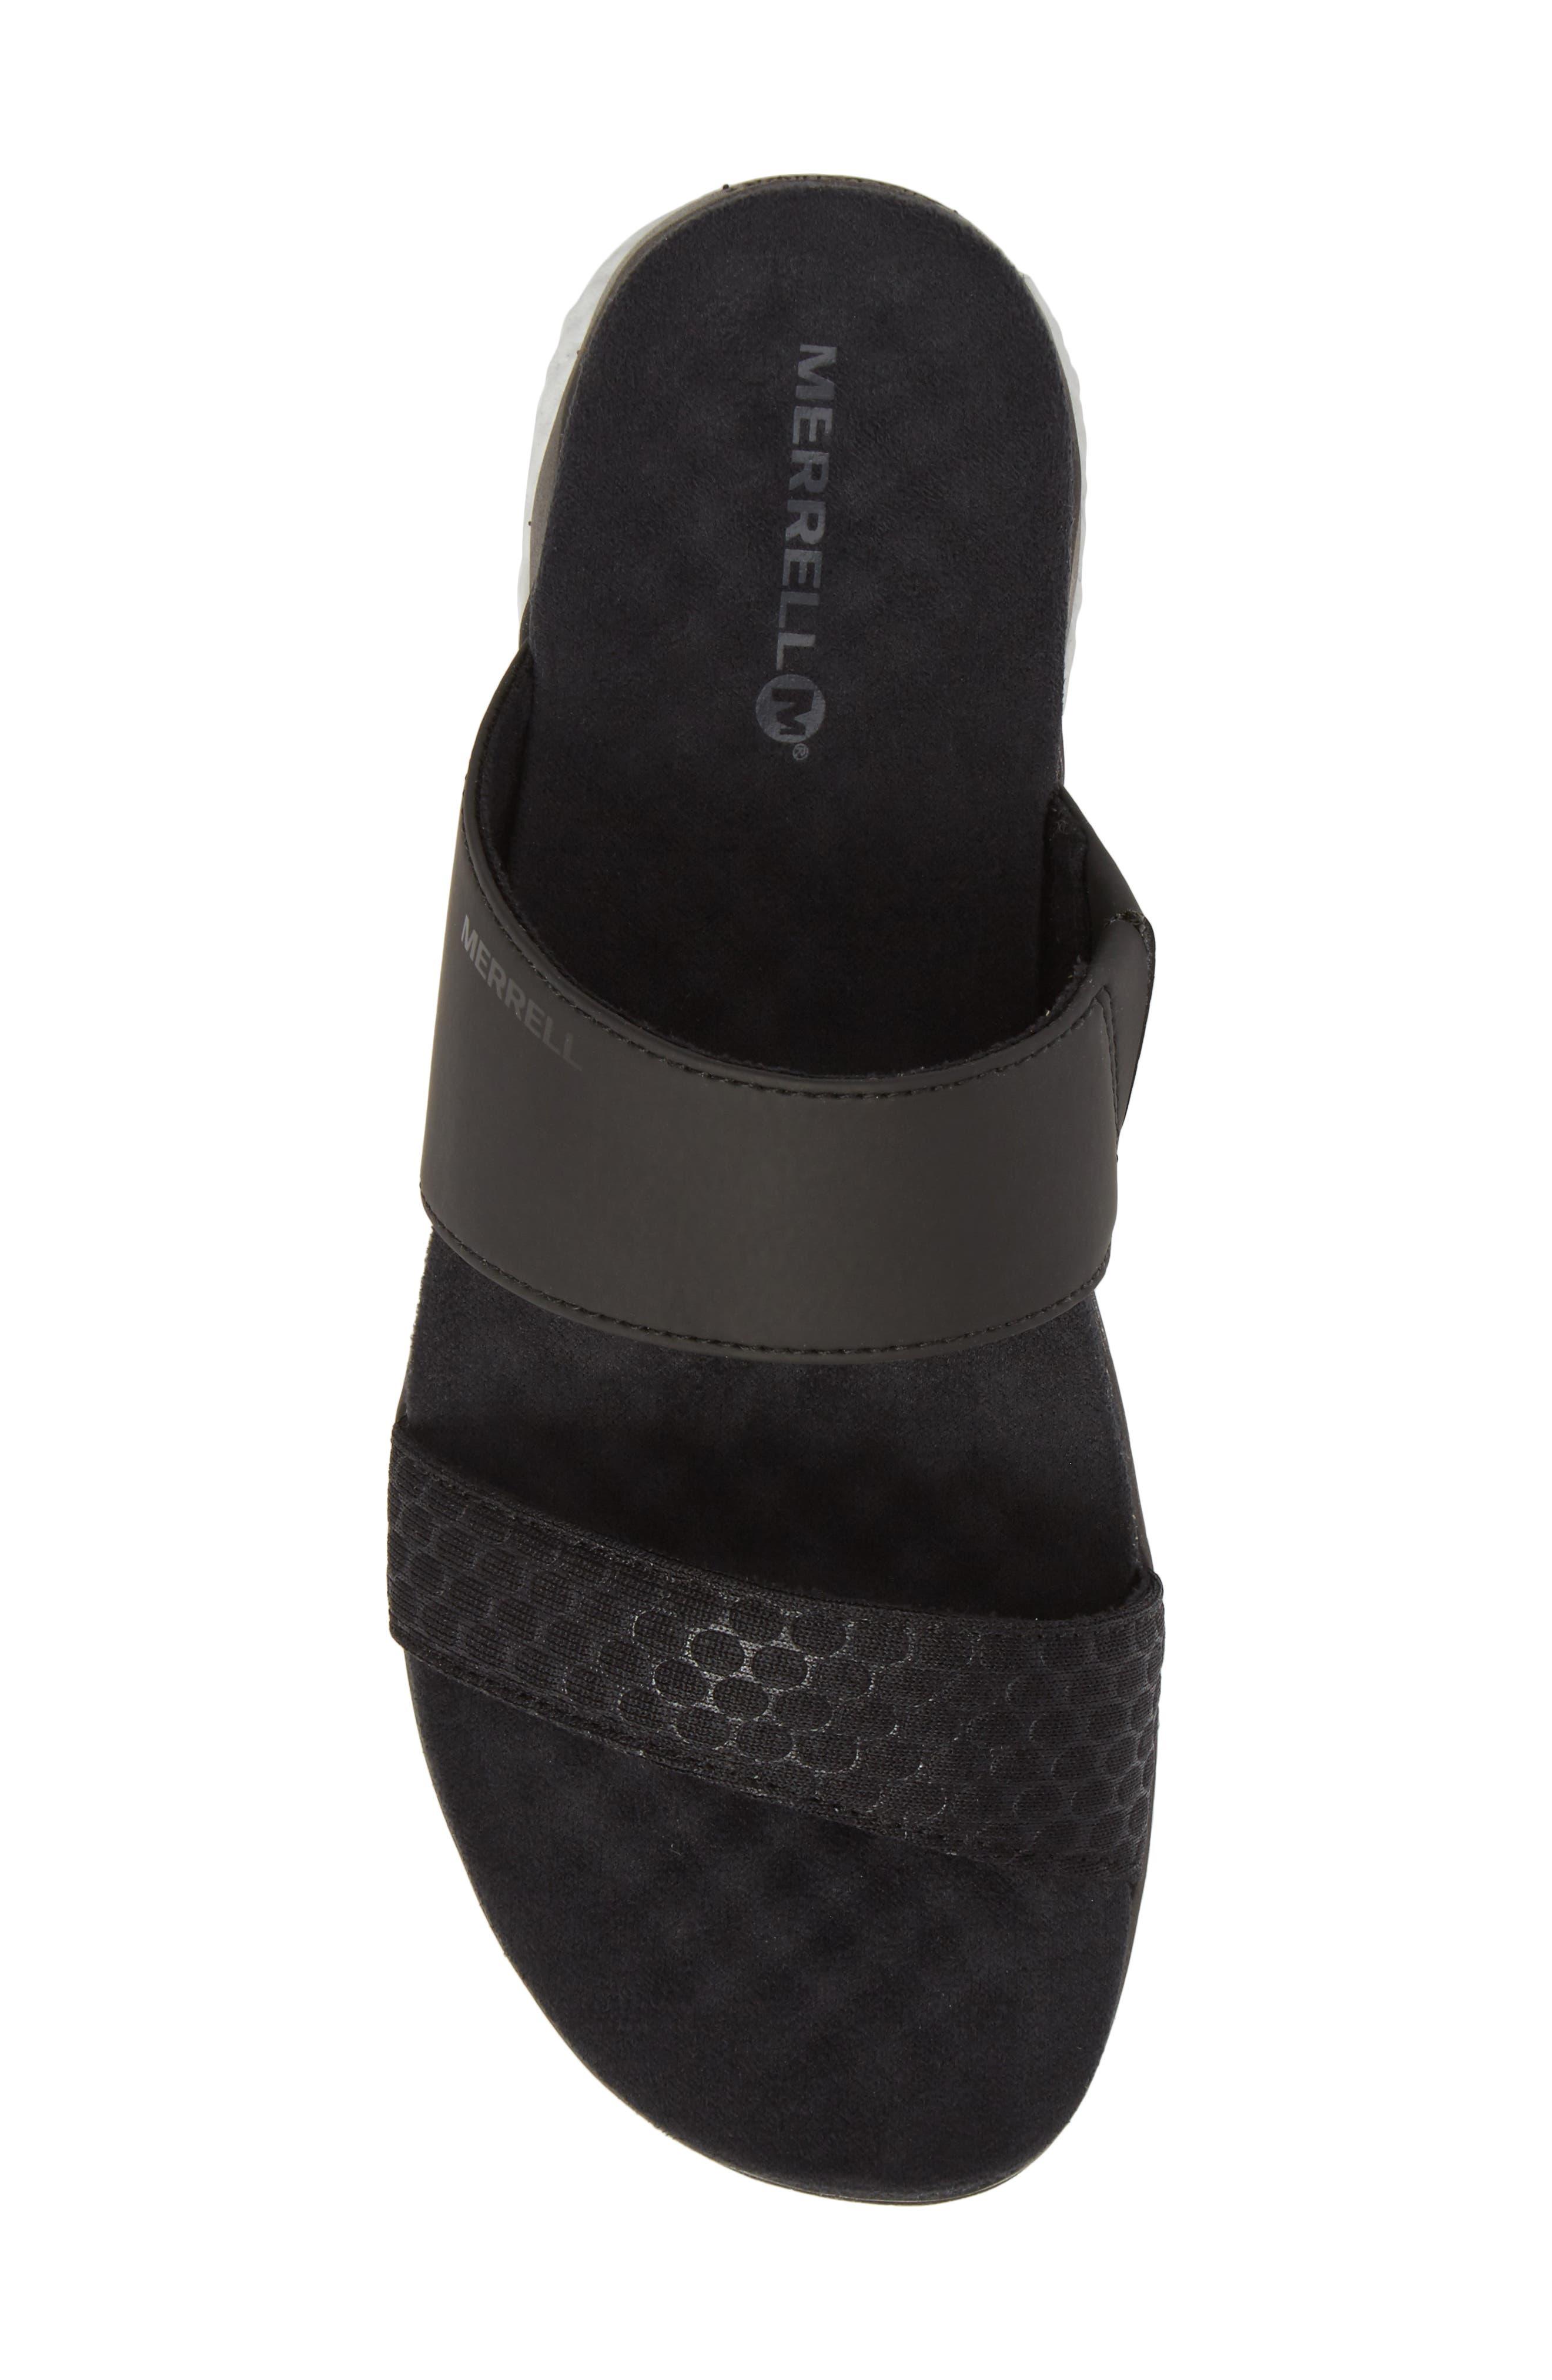 1SIX8 Linna Air Cushion+ Slide Sandal,                             Alternate thumbnail 5, color,                             Black